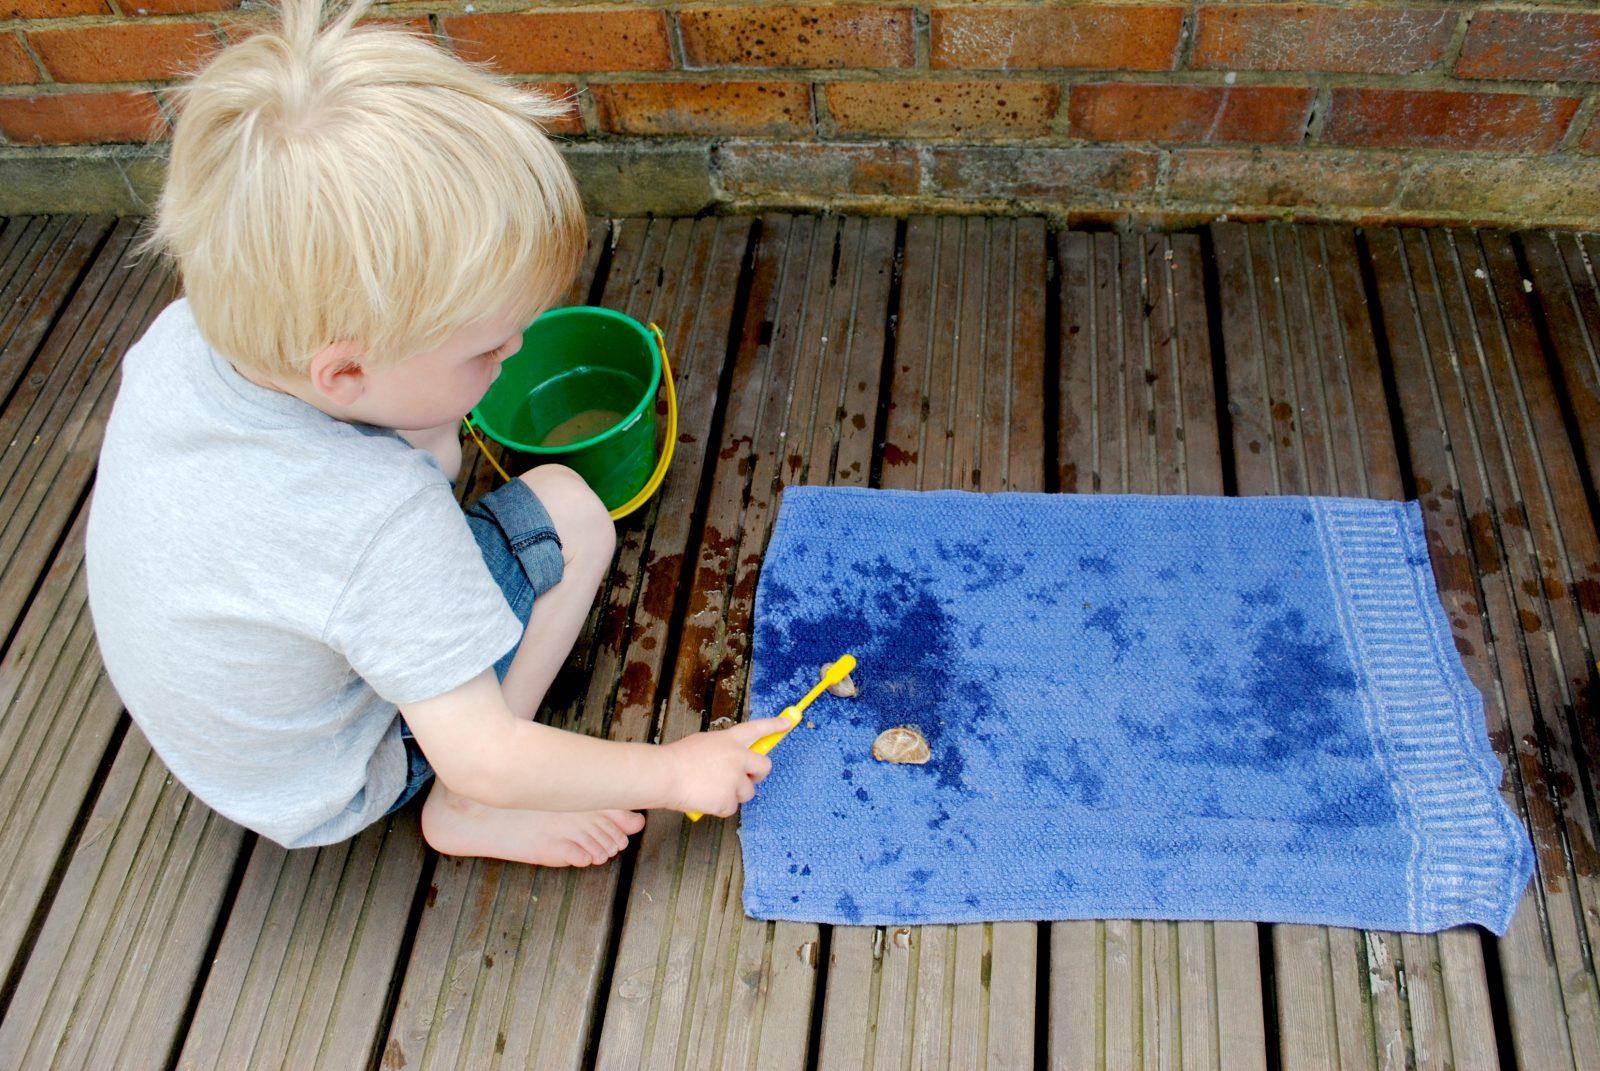 Montessori Cleaning Shells Activity